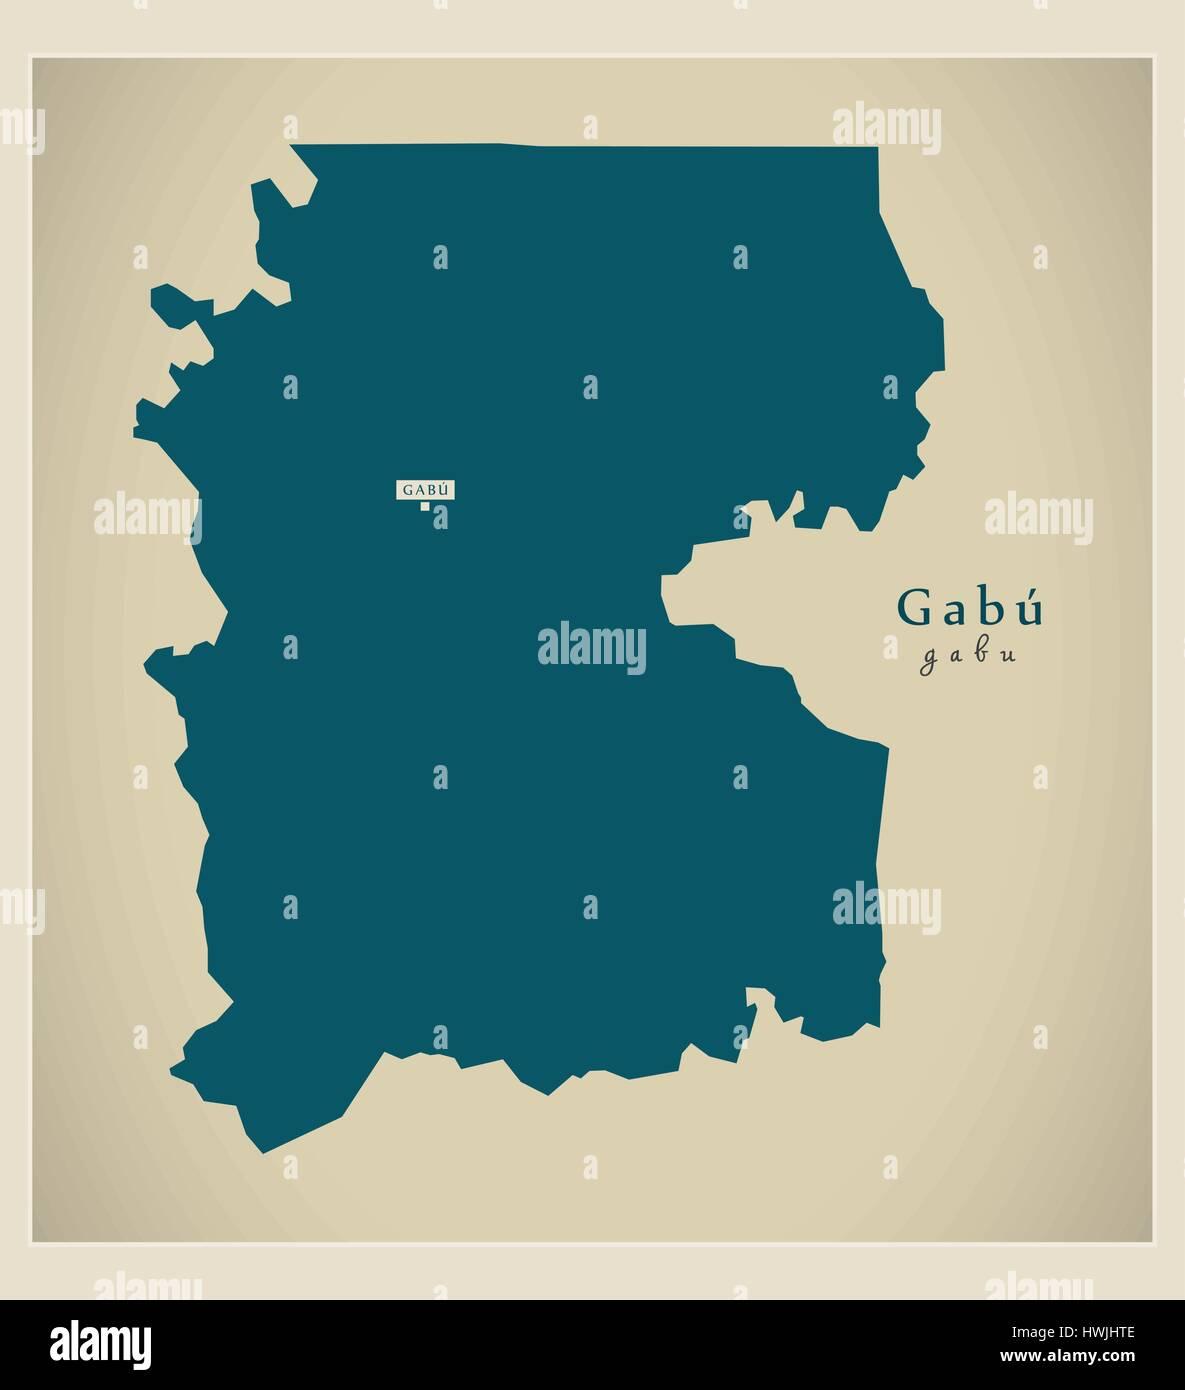 Modern Map Gabu GW Stock Vector Art Illustration Vector Image